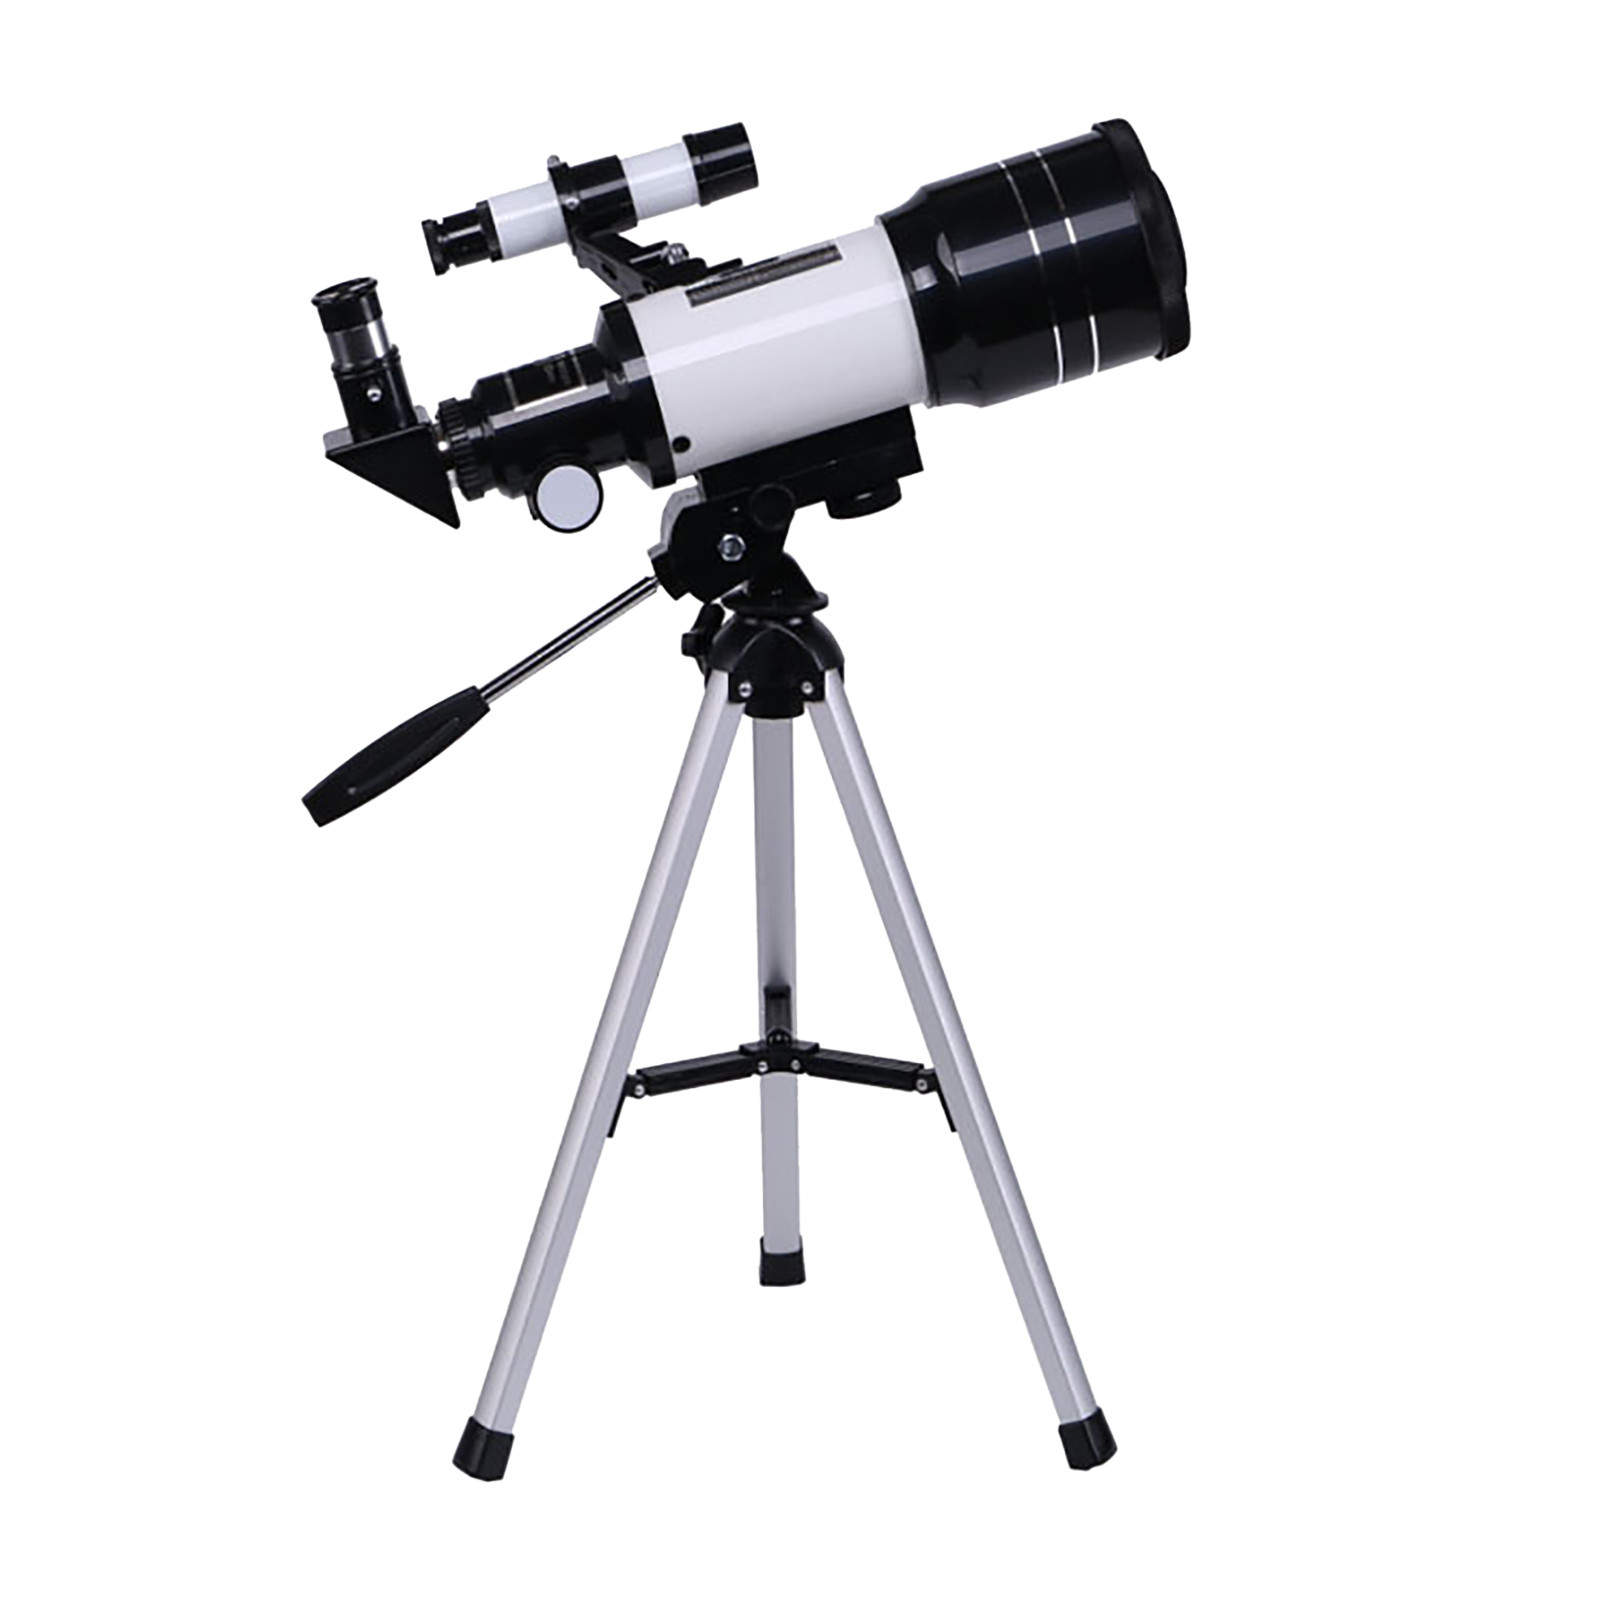 Telescope Tripod Telescope 150x Aperture Astronomical Camping Telescope 70mm  Monocular 30 Telescopio Outdoor Stargazing